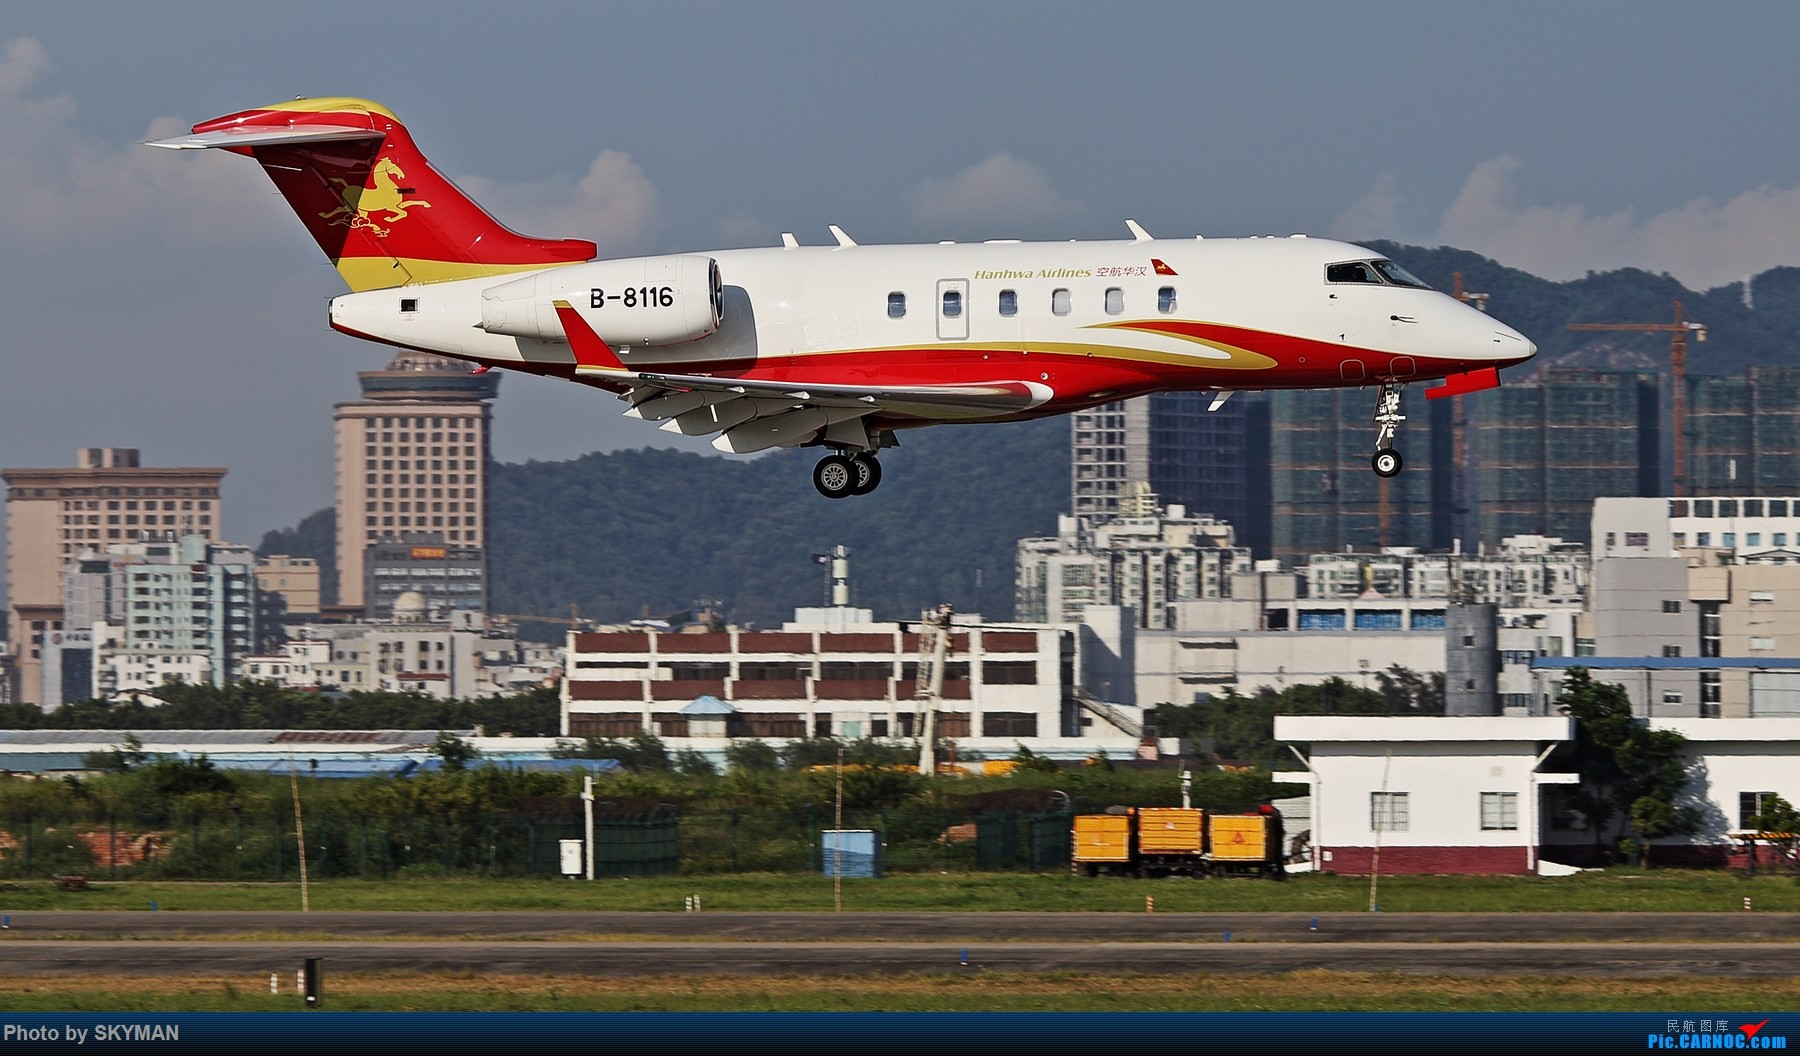 Re:[原创]BLDDQ 冒冒冒冒冒冒冒冒个泡泡泡泡泡泡泡泡泡 BOMBARDIER CL300 B-8116 中国深圳宝安国际机场